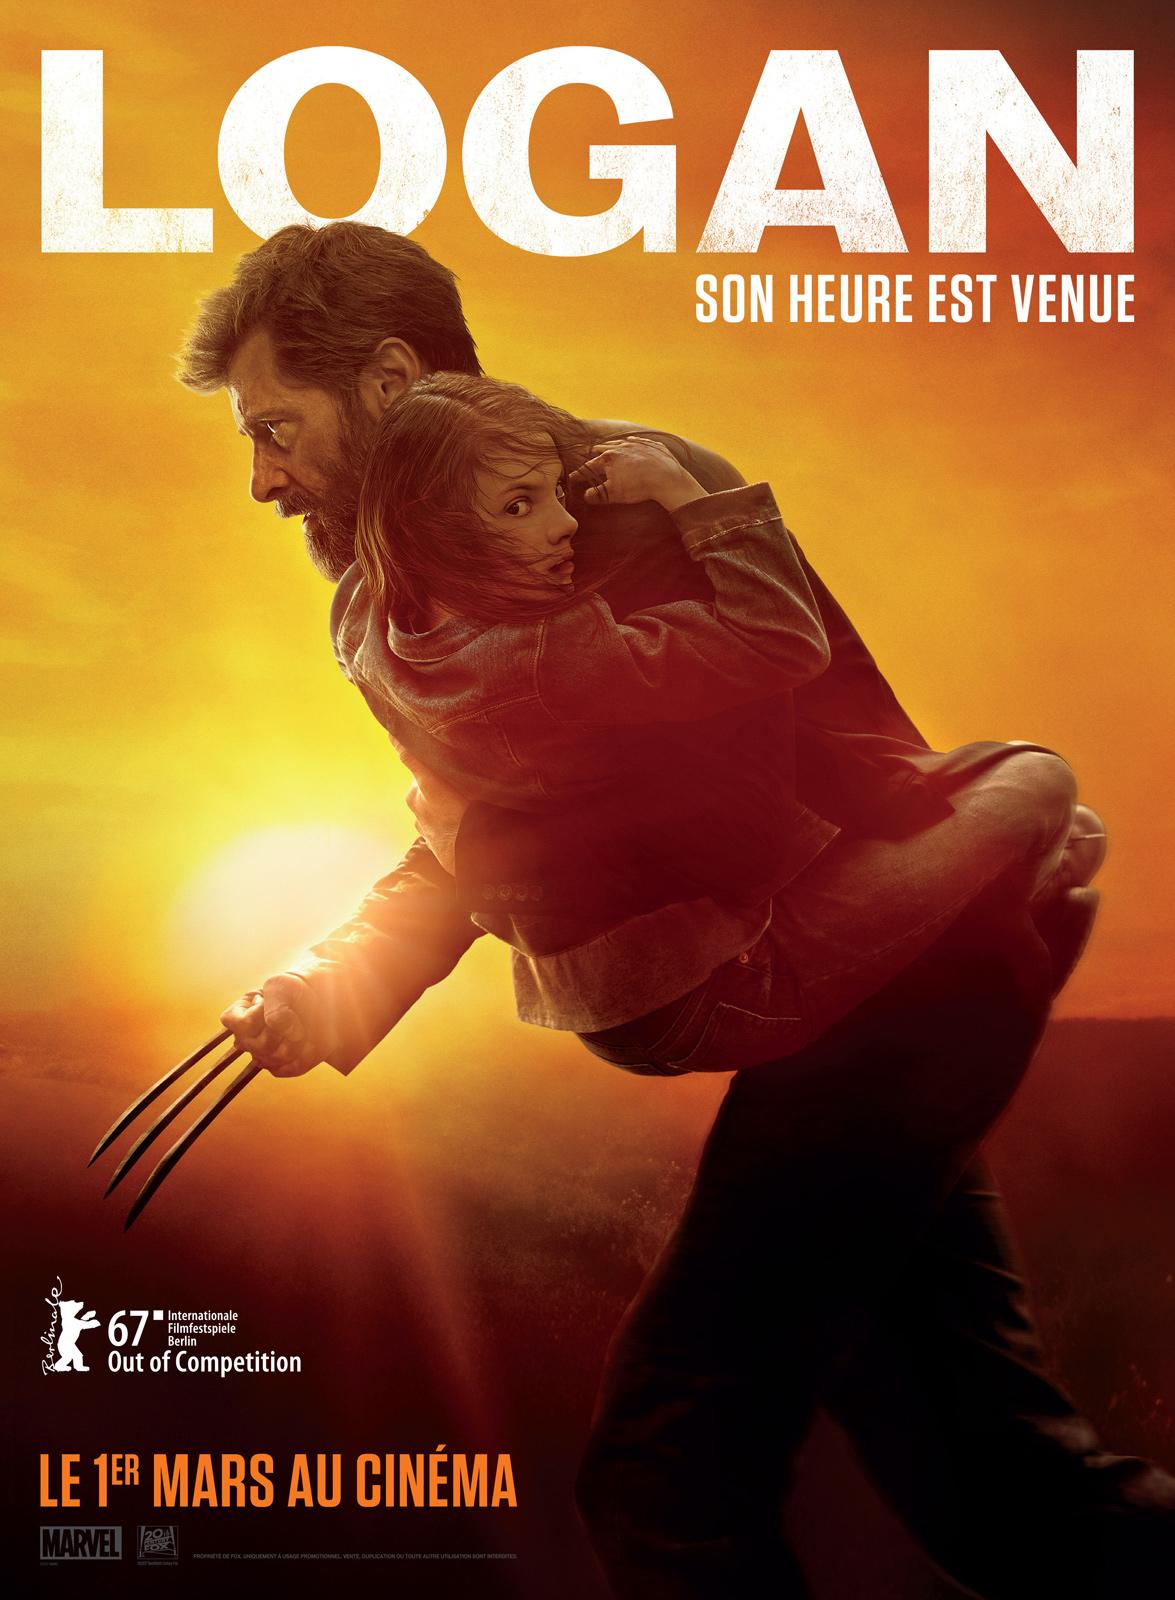 Logan Français HDRiP